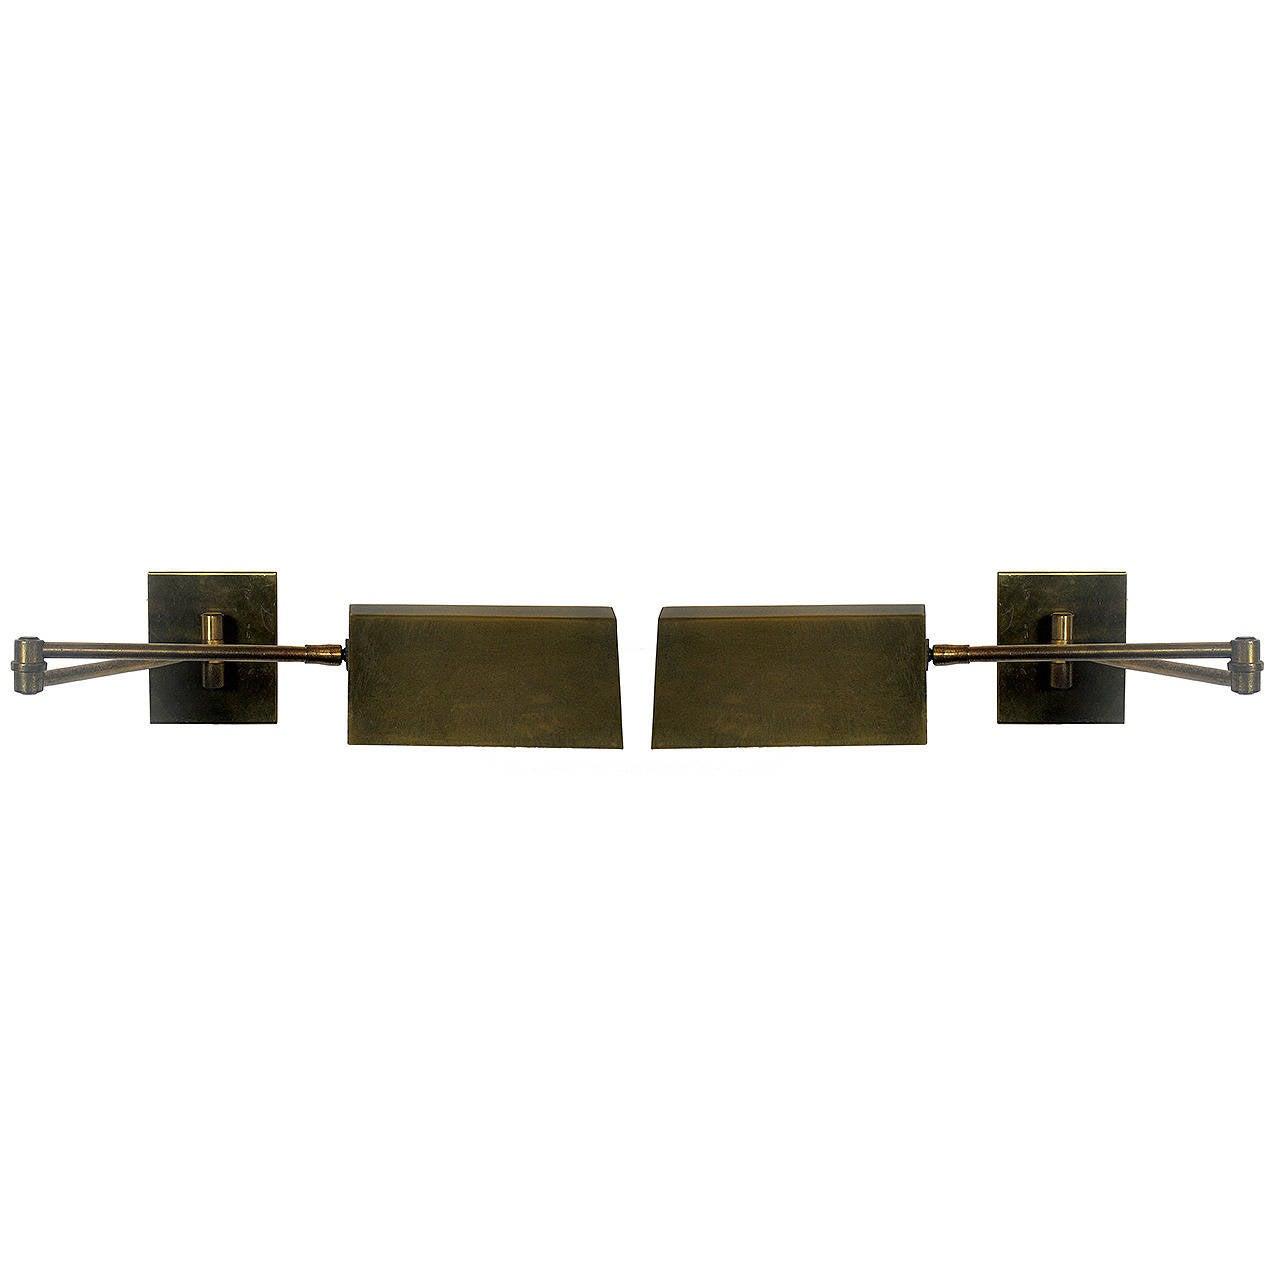 Pair of Brass Swing Arm Sconces